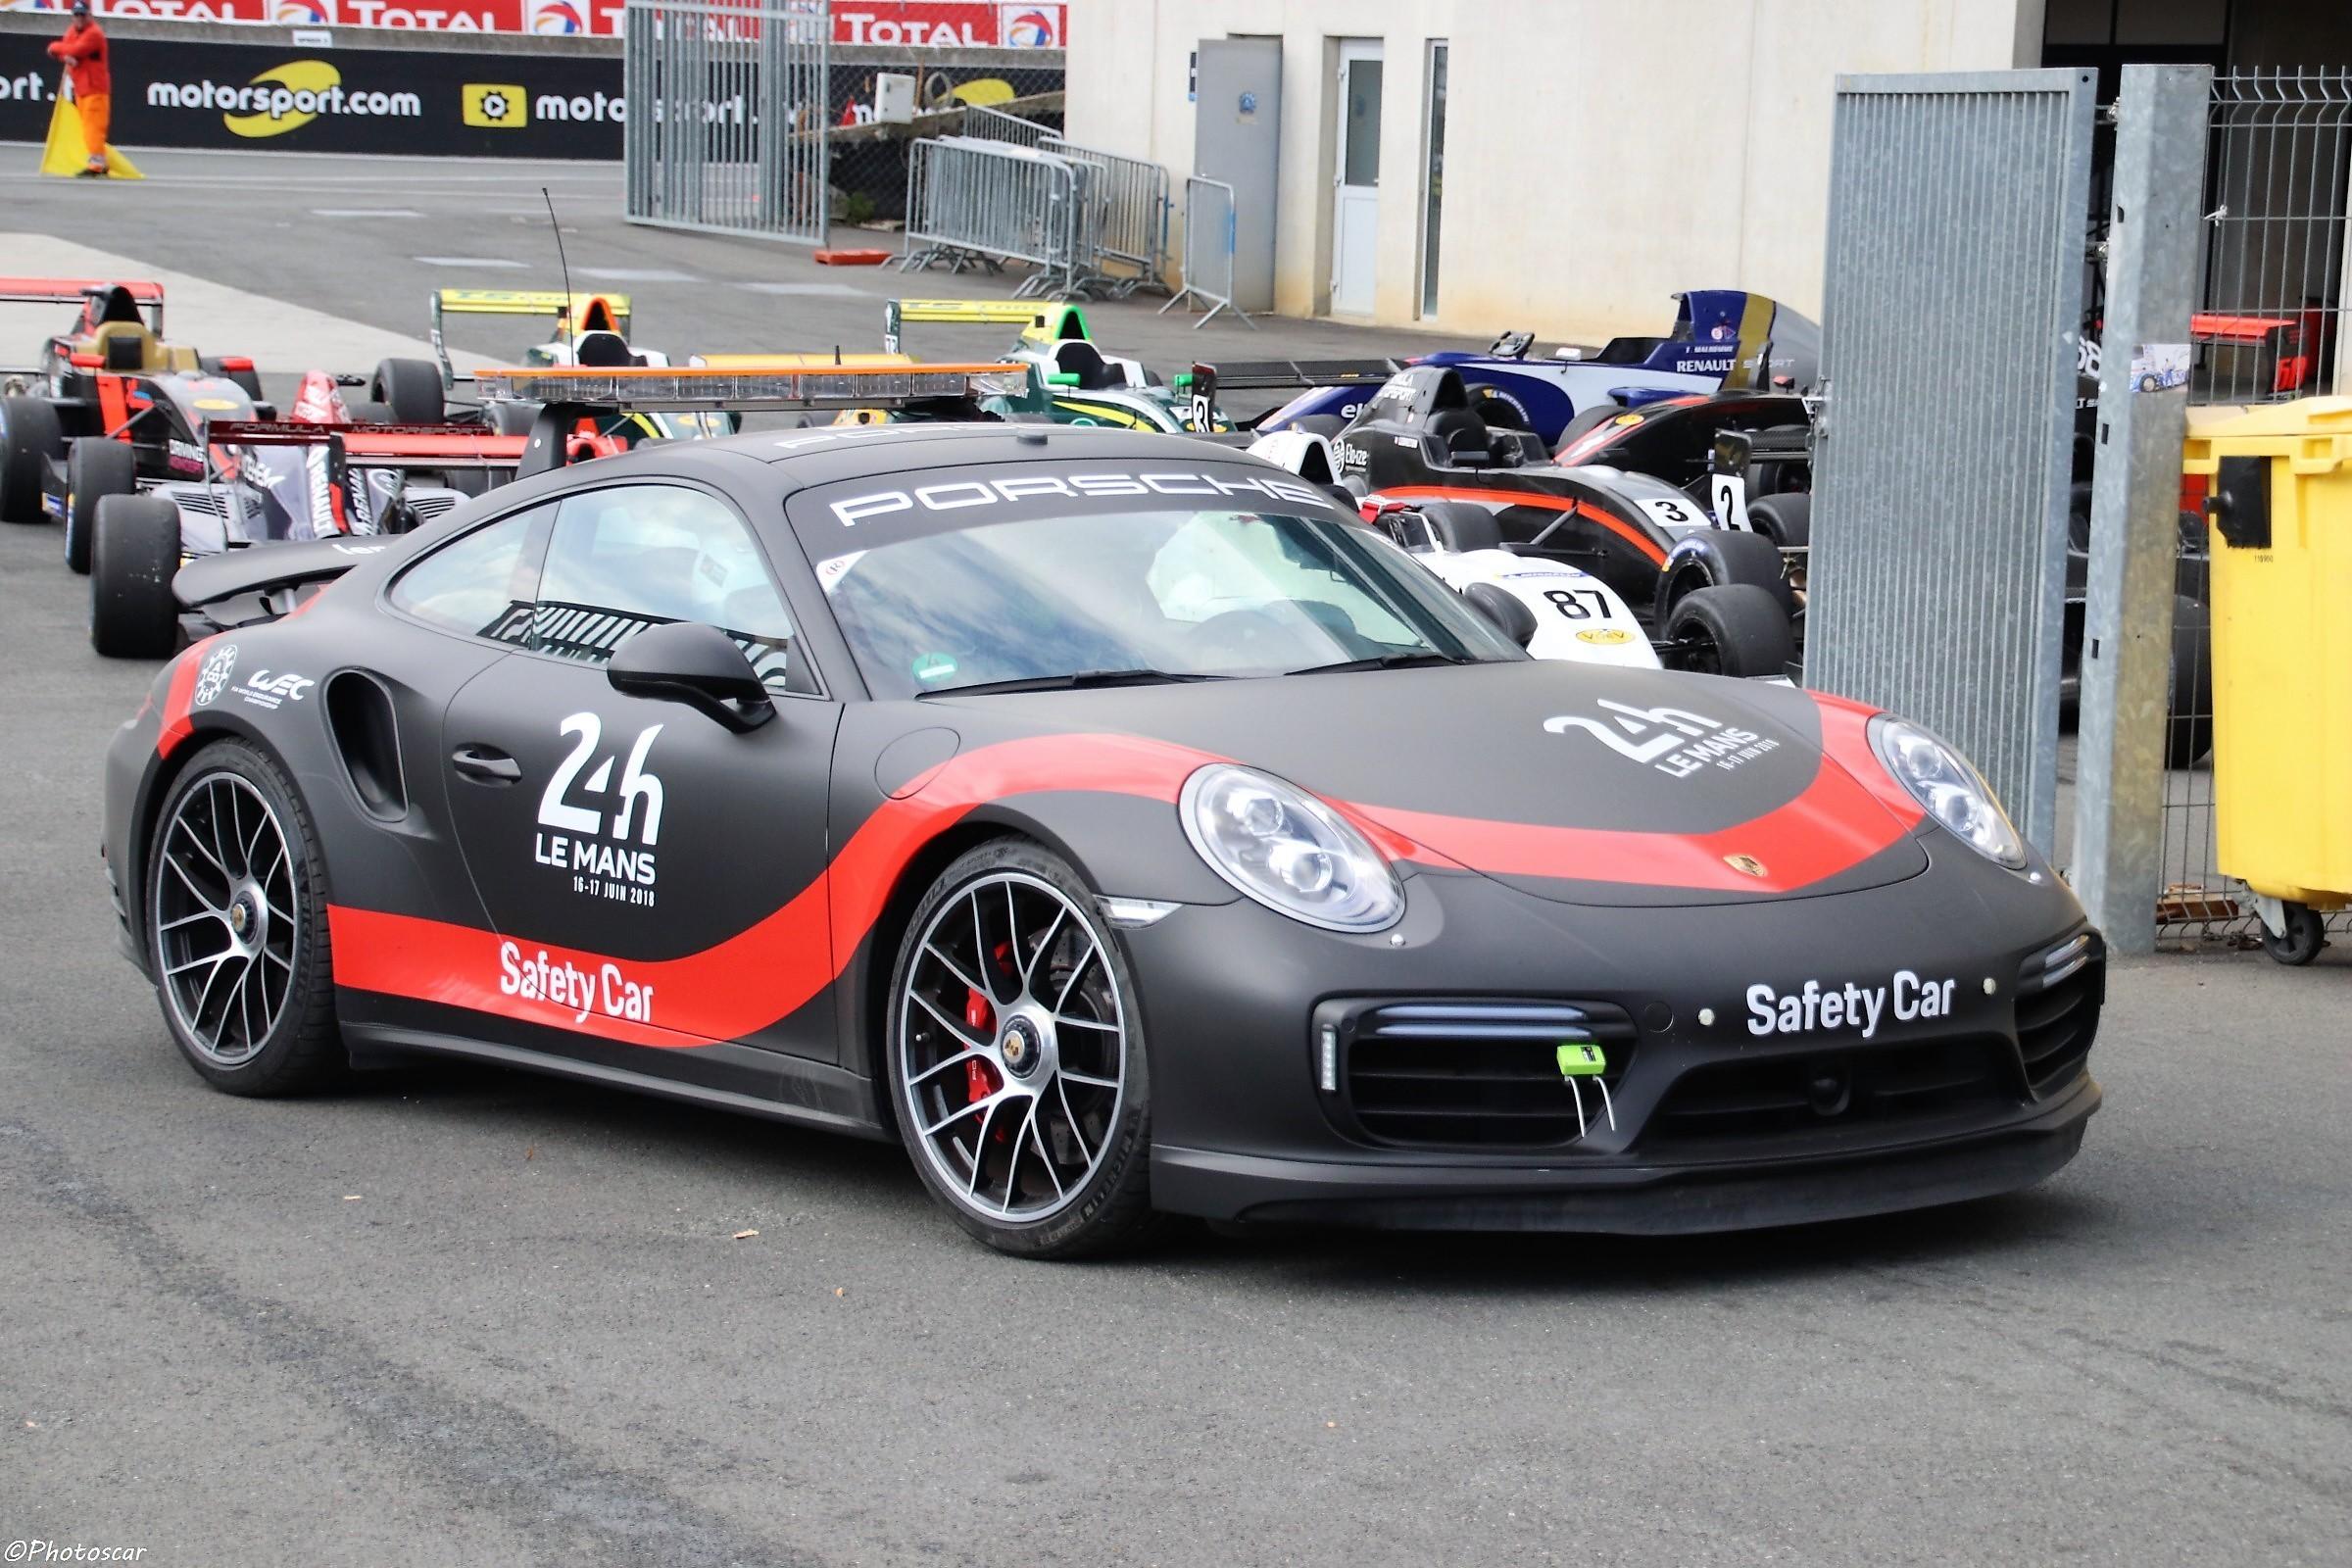 VdeV 2018 - Porsche 911 Turbo Safety Car